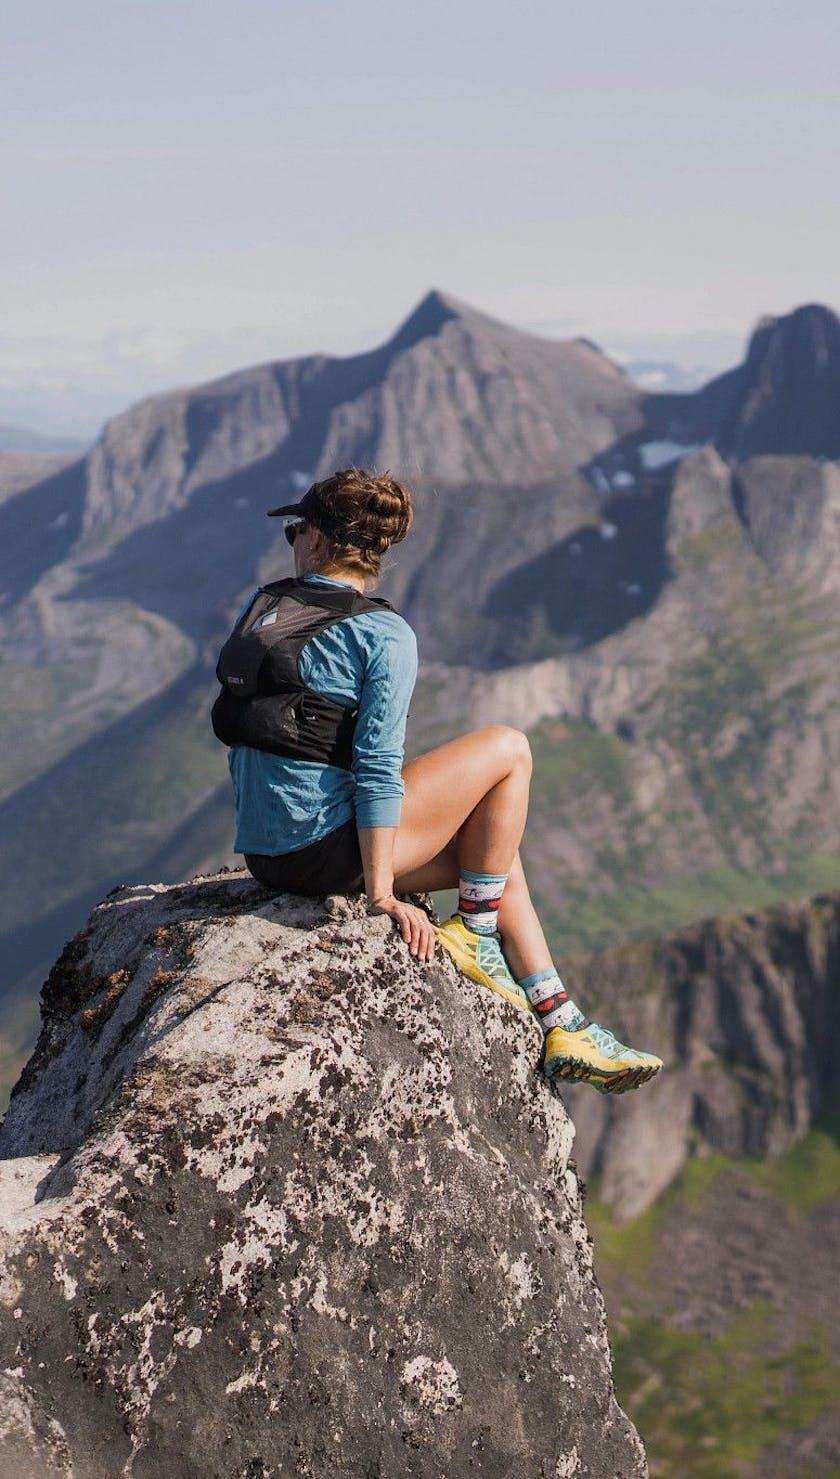 Hillary Gerardi wearing a Distance 4 hydration pack while enjoying a mountain vista